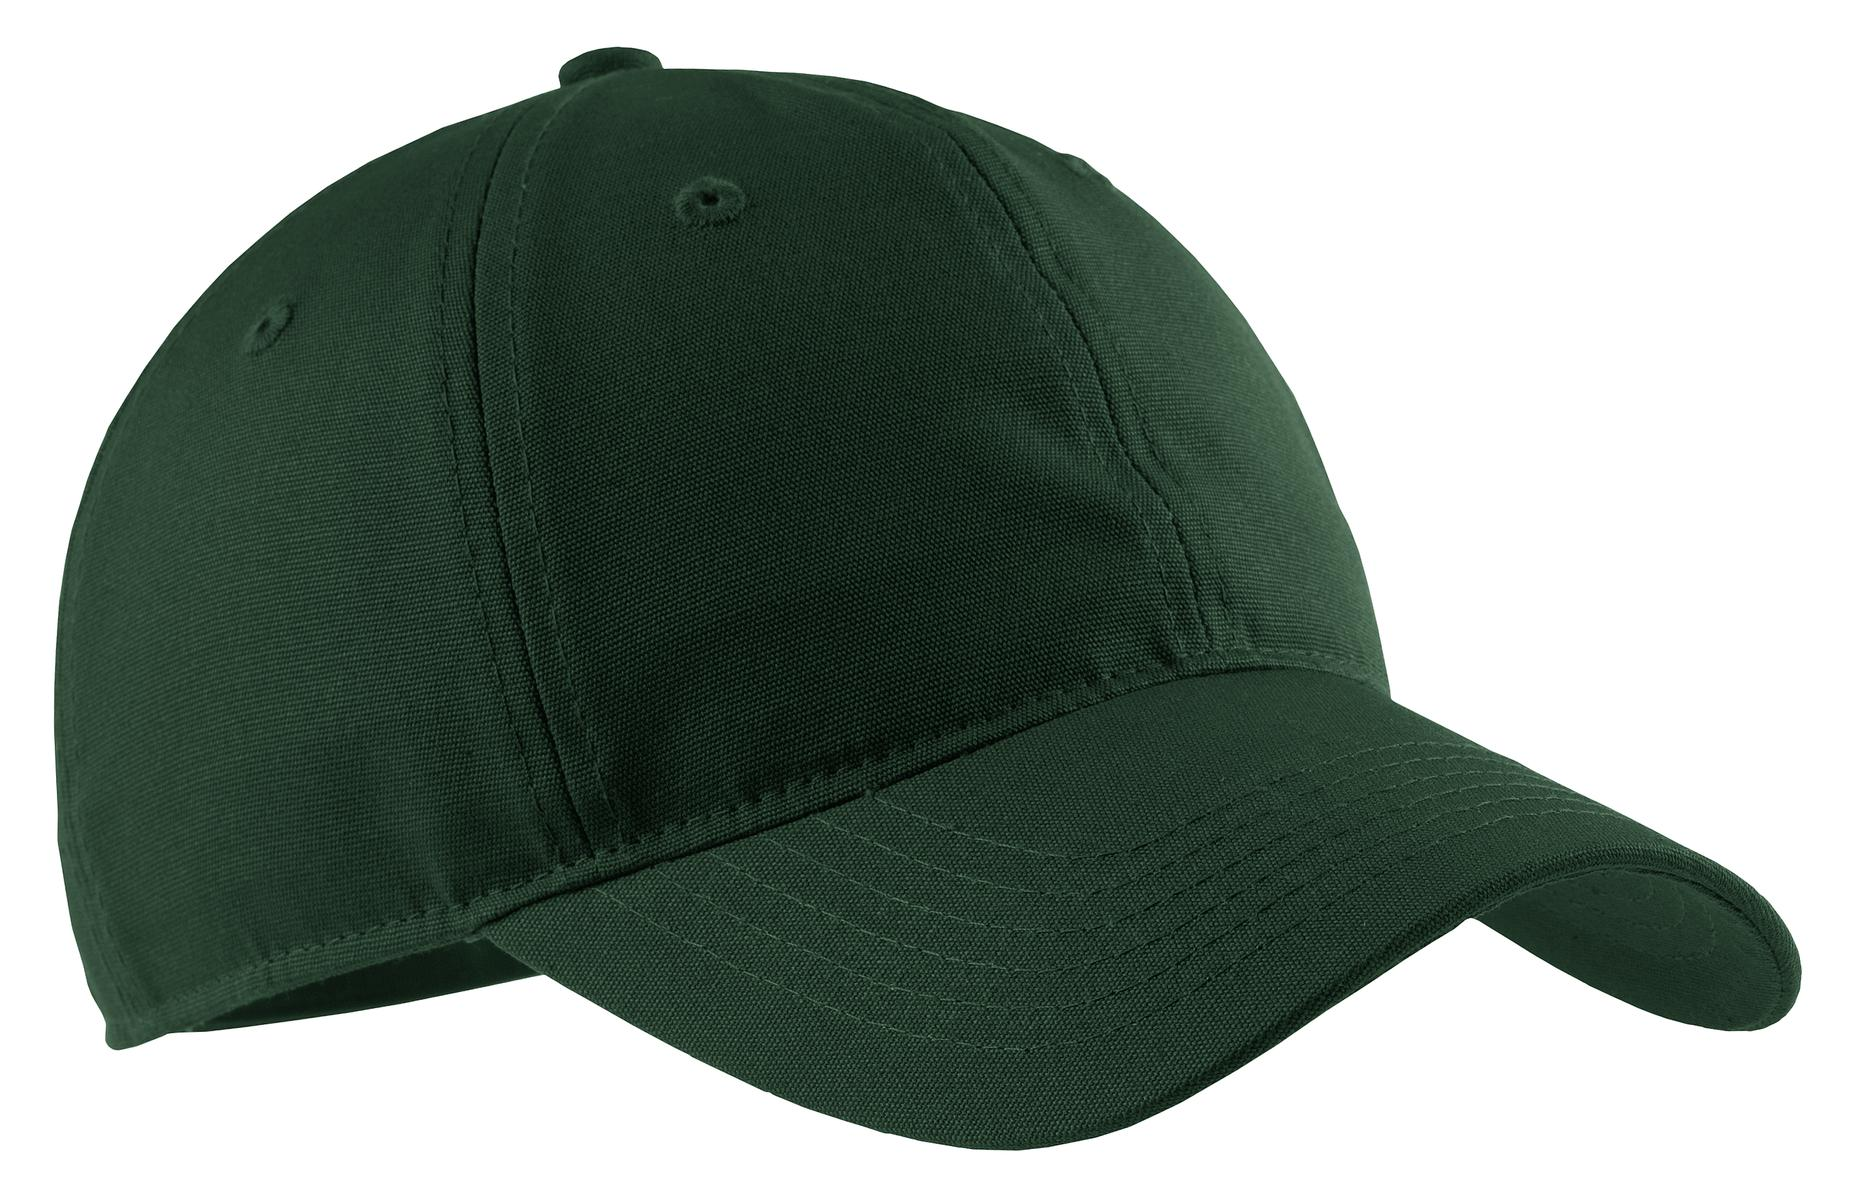 Port & Company® - Soft Brushed Canvas Cap.